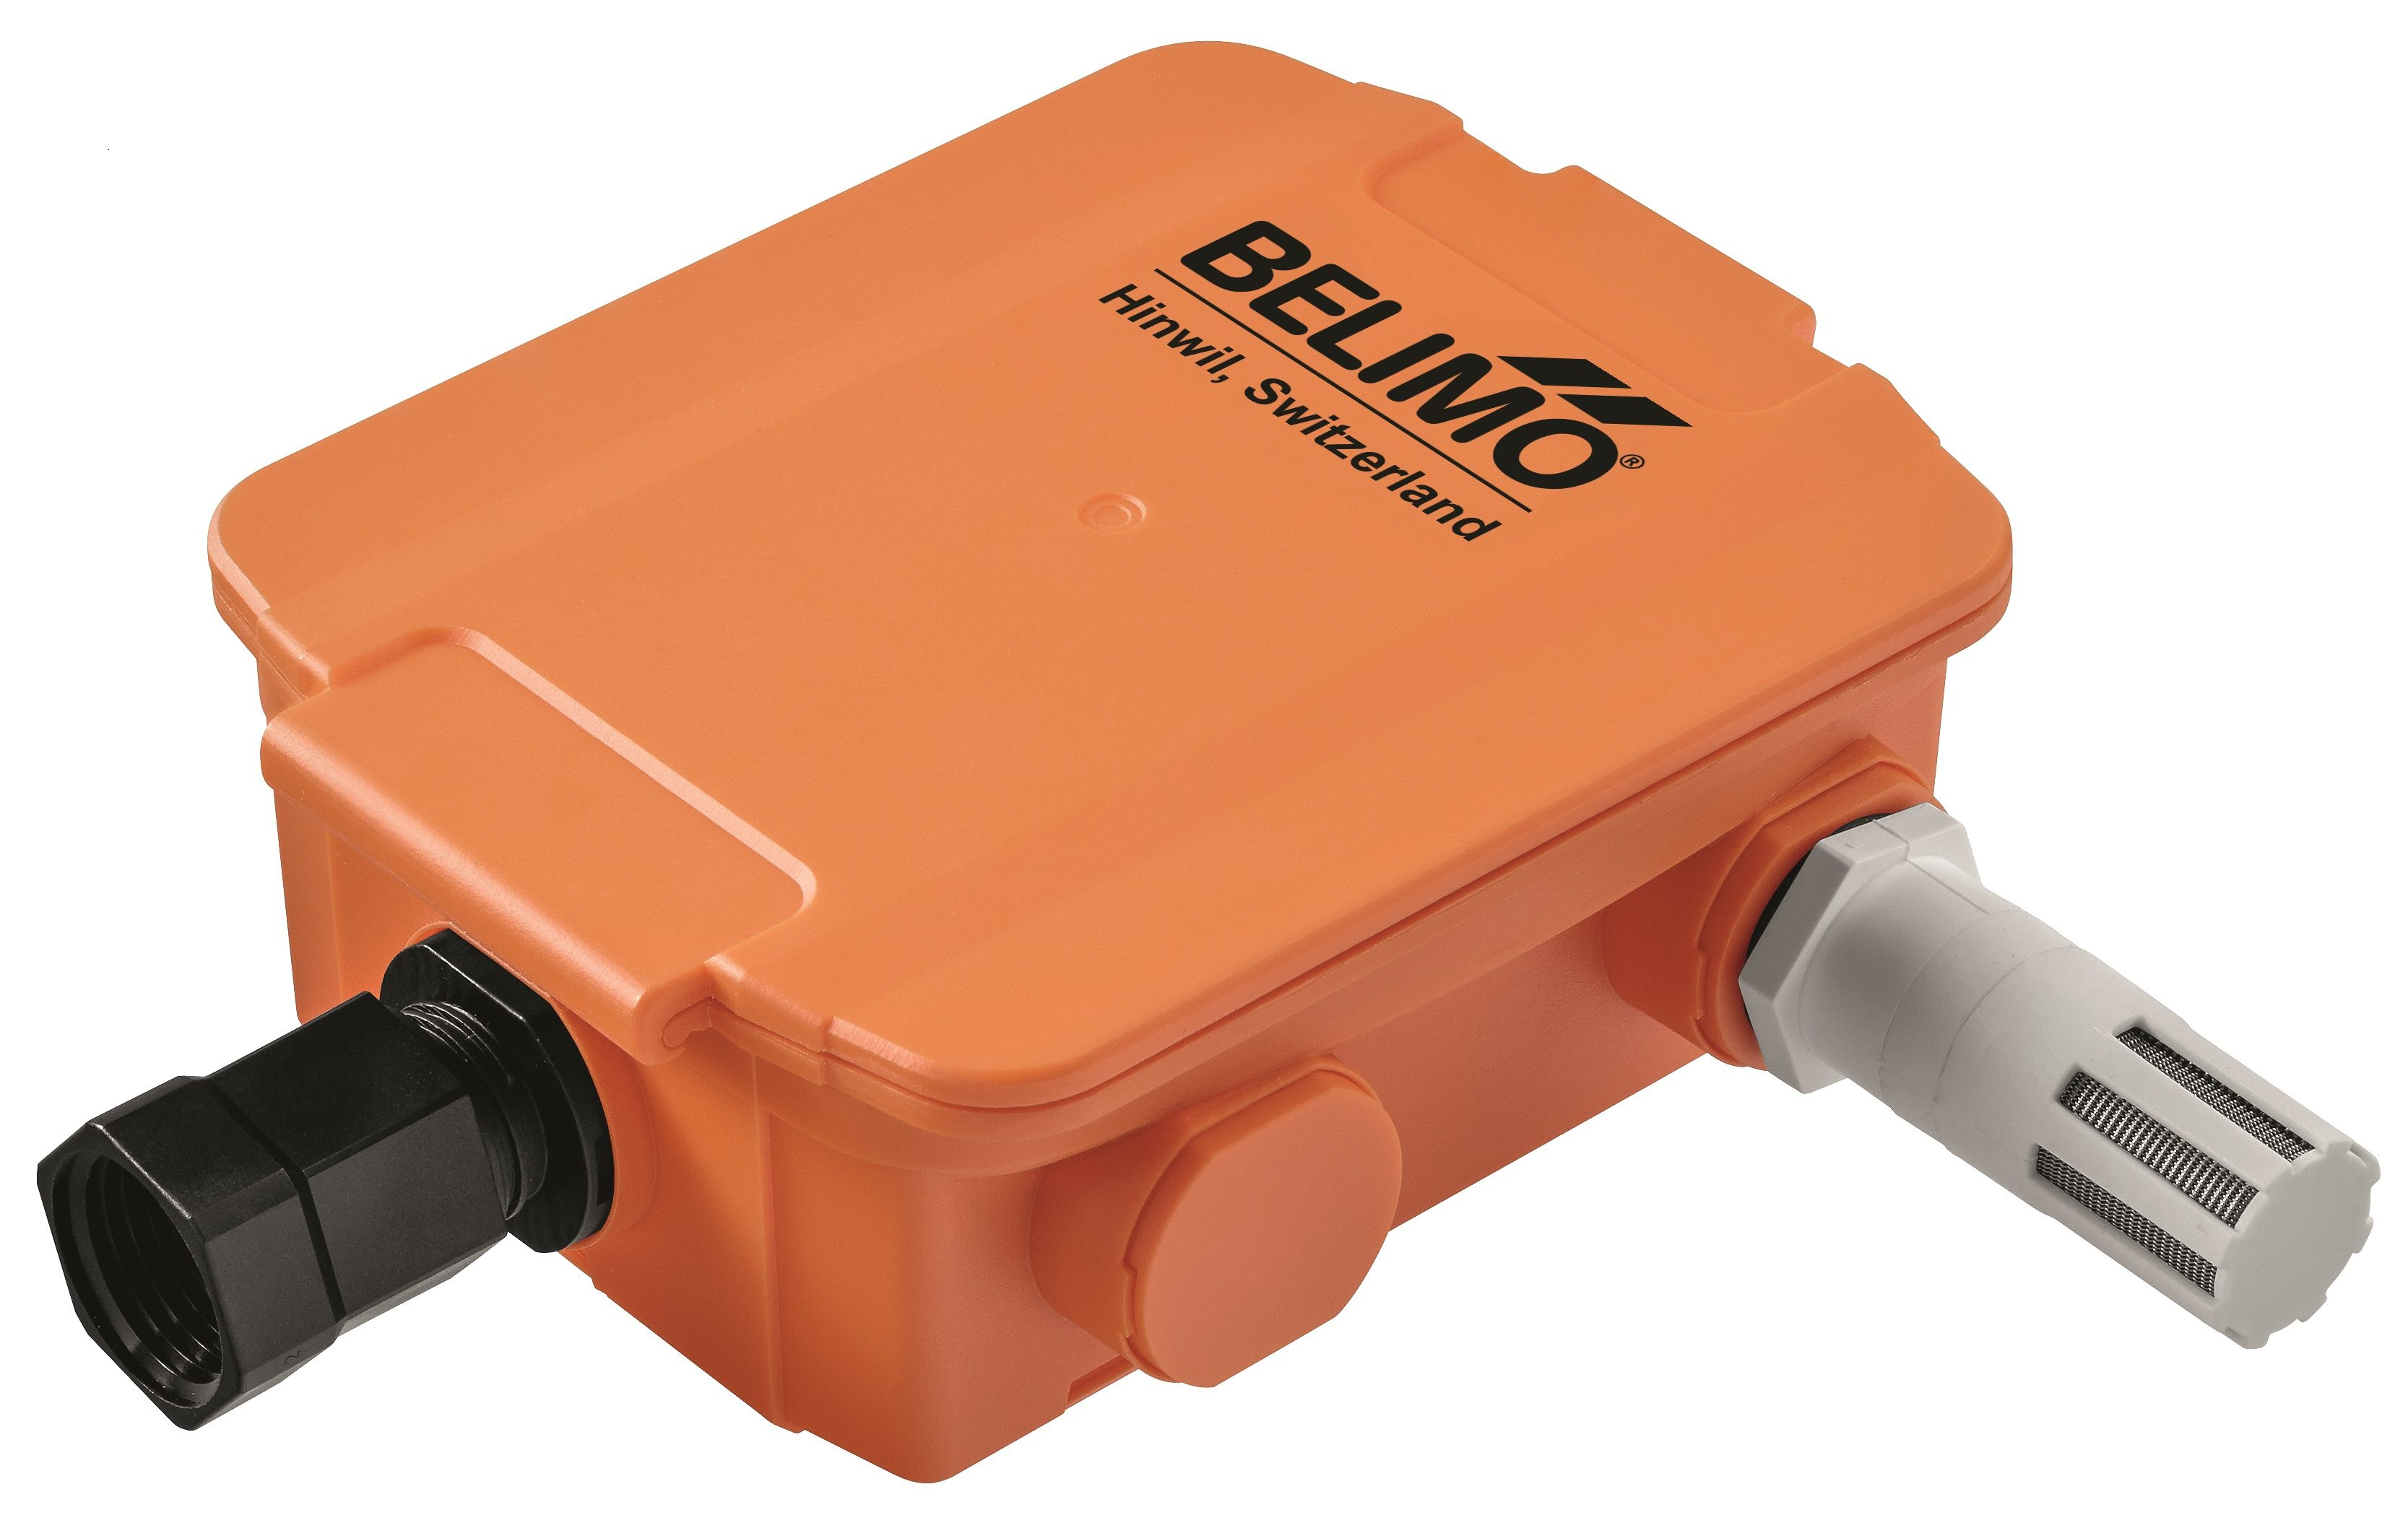 Belimo Belimo HVAC Sensors (2017) 22UTH-510X Sensors